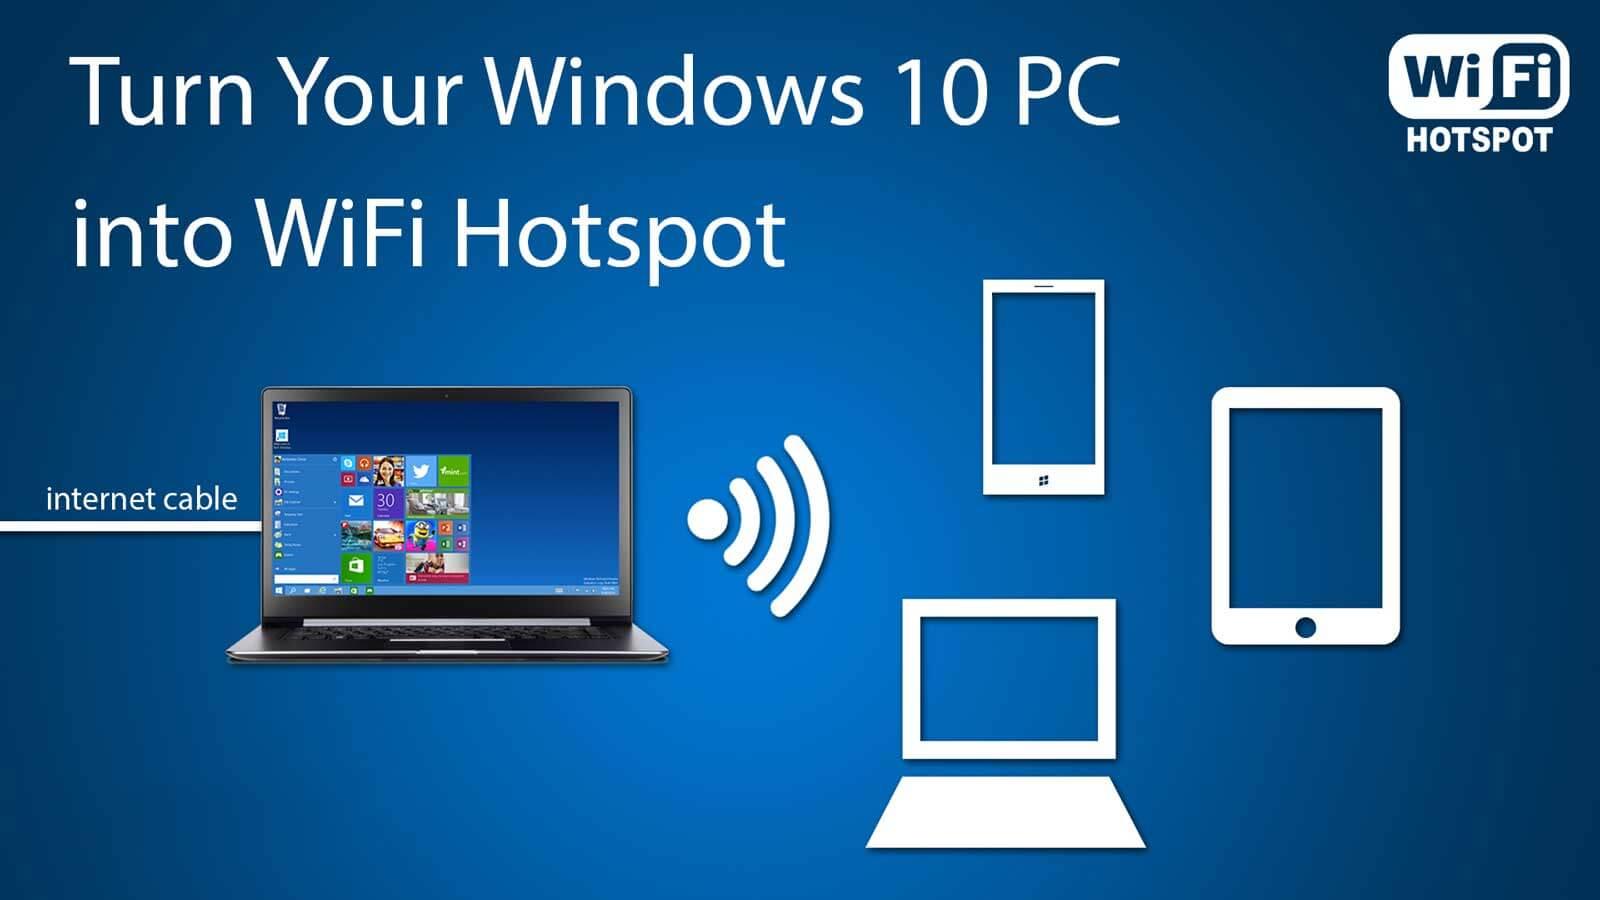 WİFİ HotSpot Windows 10 WİFİ HotSpot Sorunu Windows 10 WİFİ HotSpot Sorunu wifi hotspot